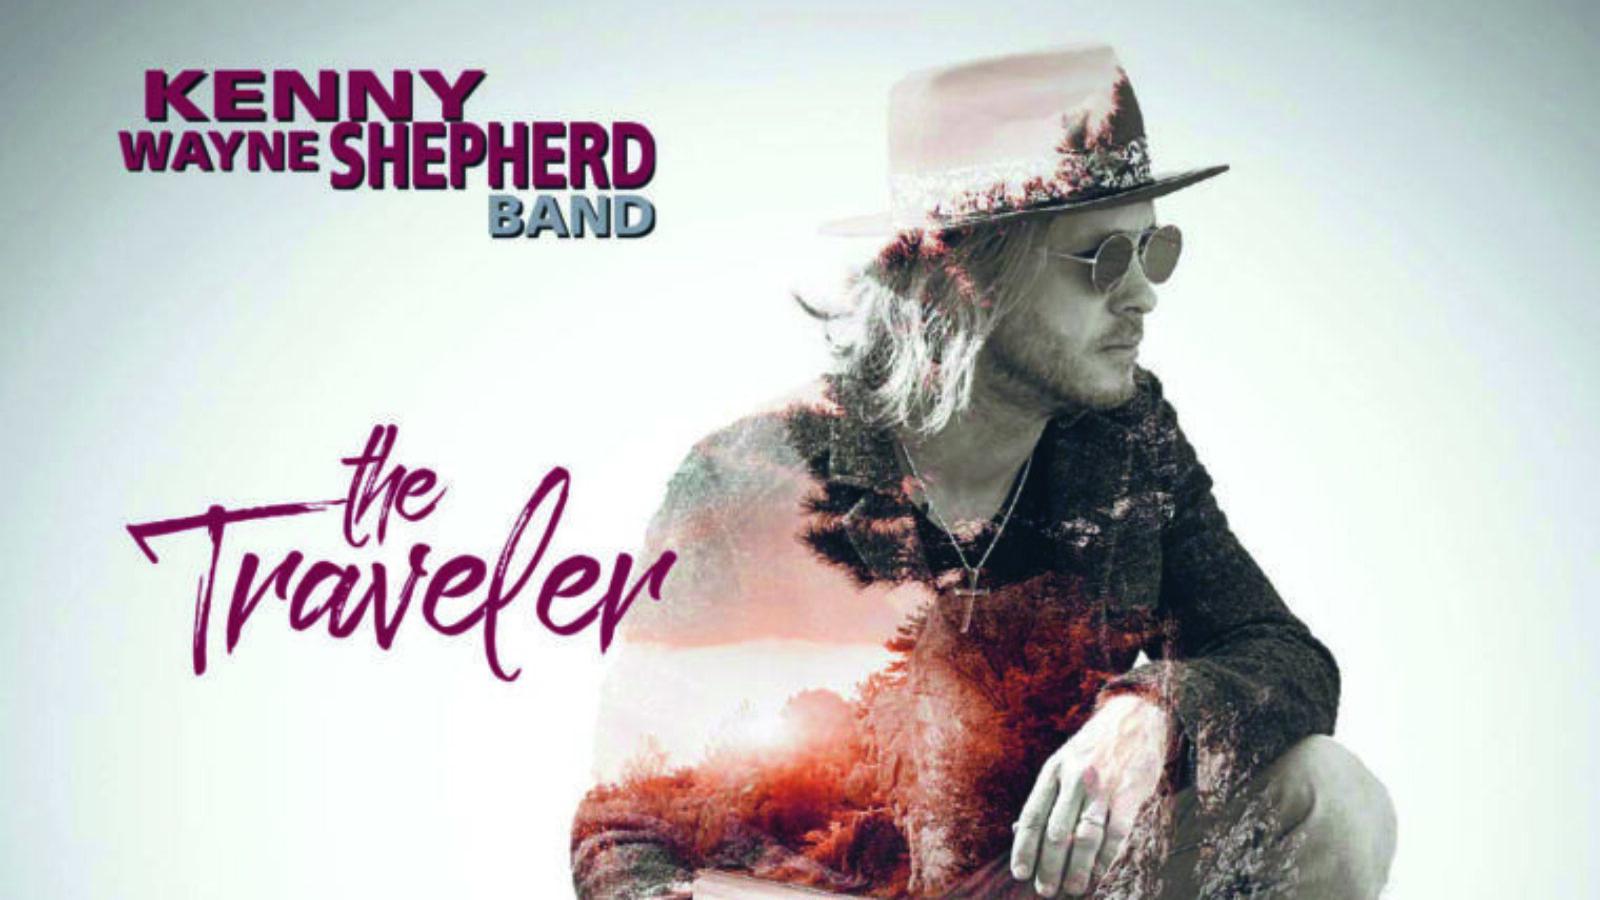 Kenny Wayne Shepherd – The Traveler